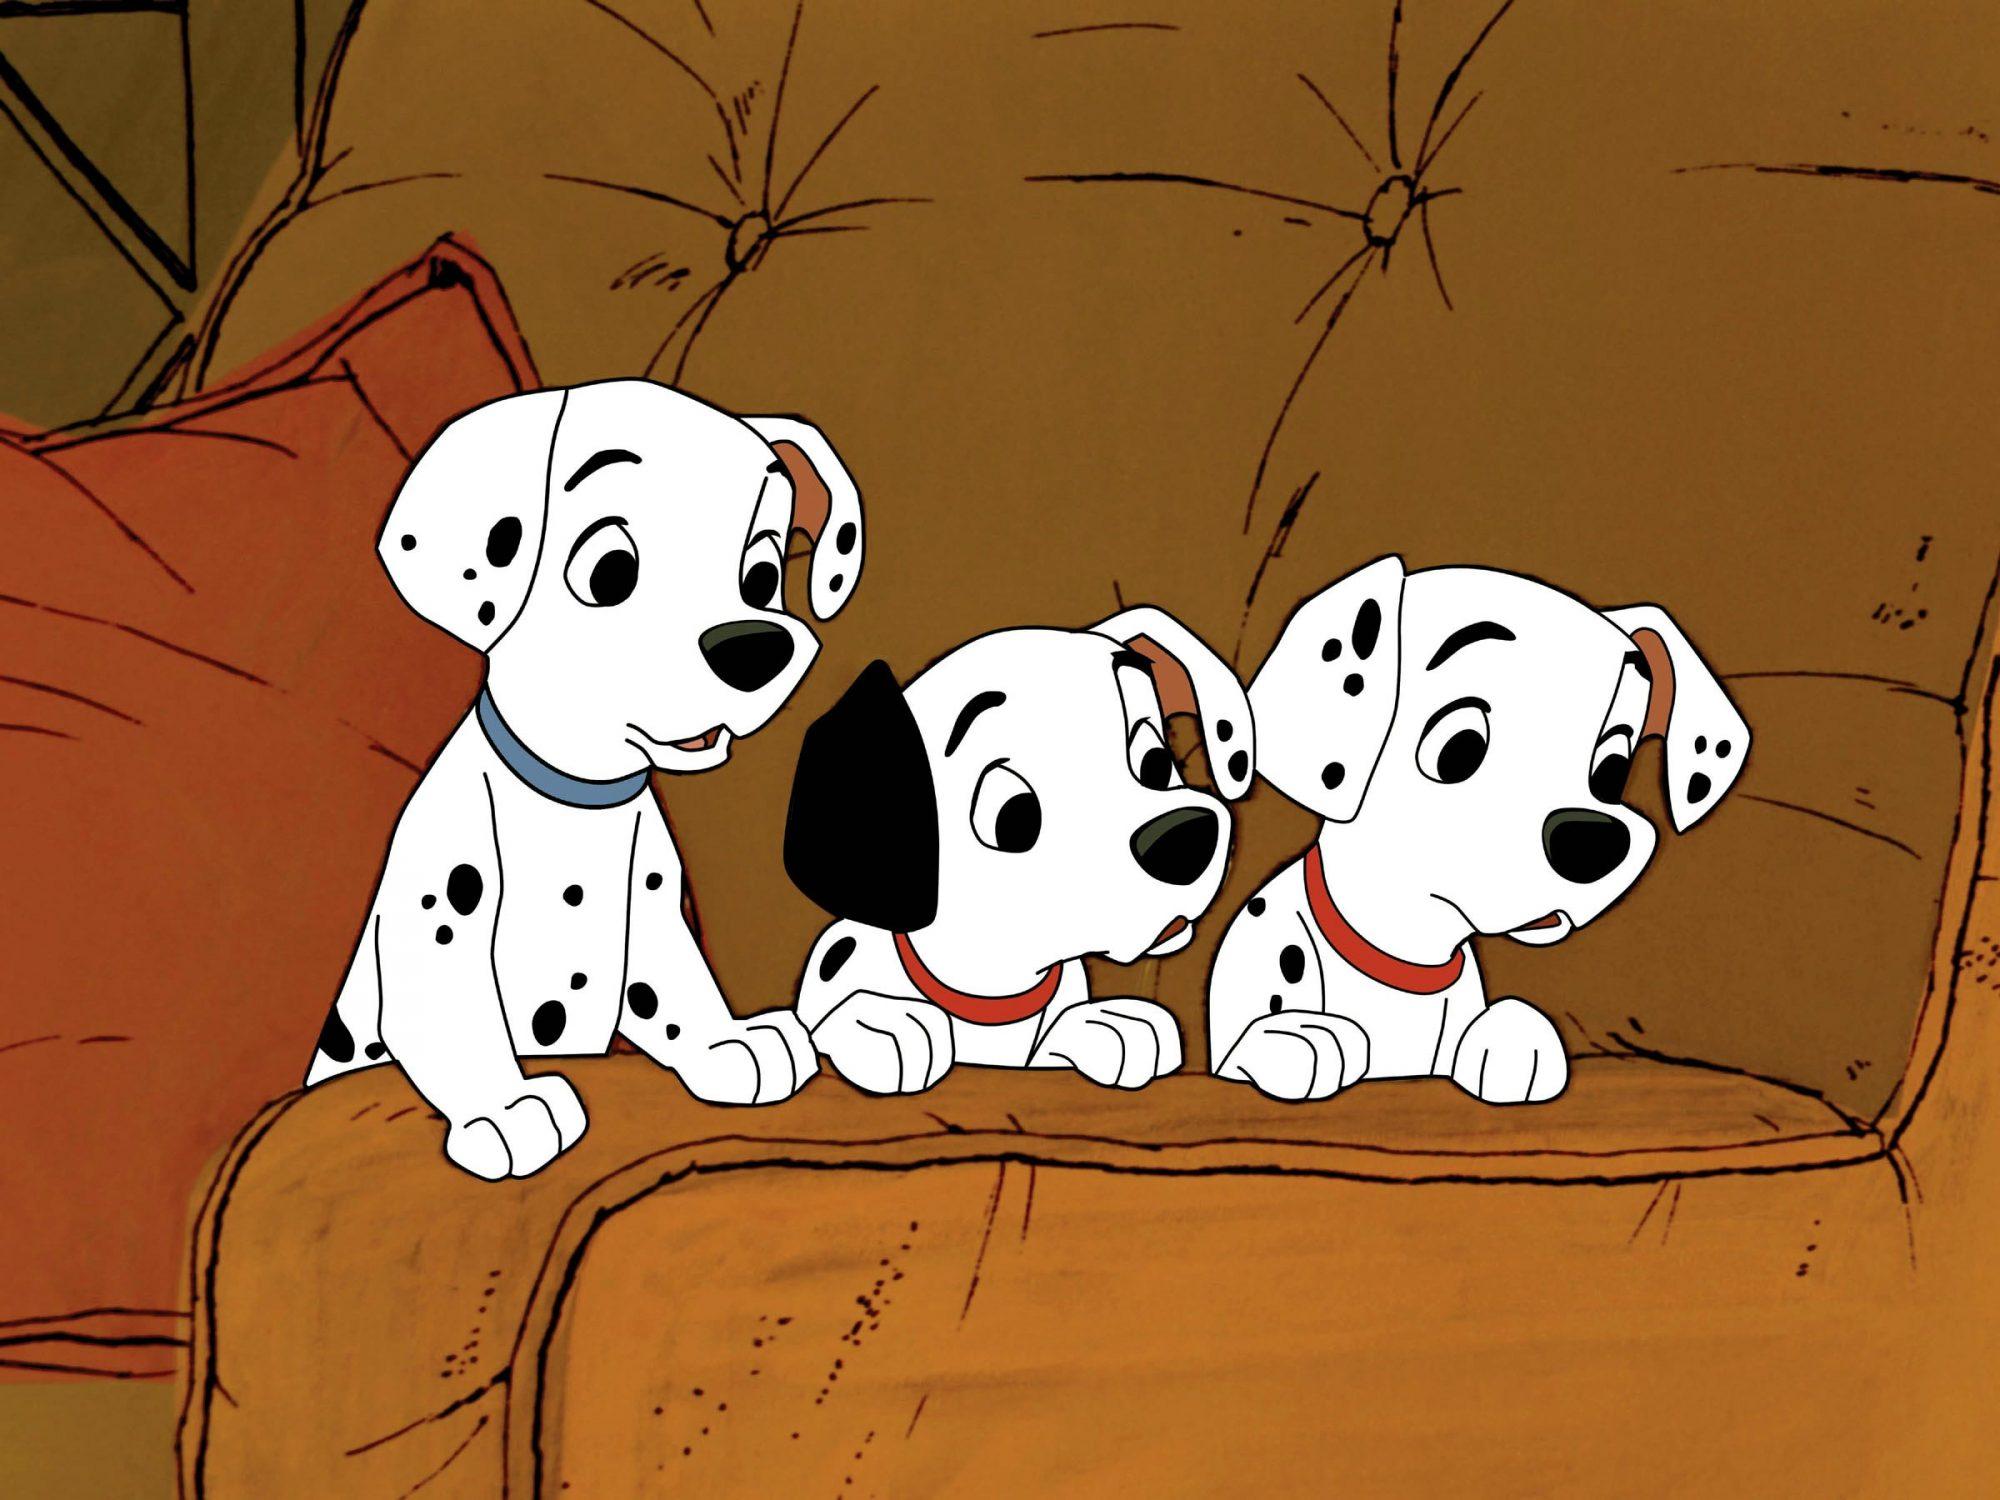 101 DALMATIANS (aka ONE HUNDRED AND ONE DALMATIANS), Dalmatian puppies, 1961, ©Walt Disney Pictures/